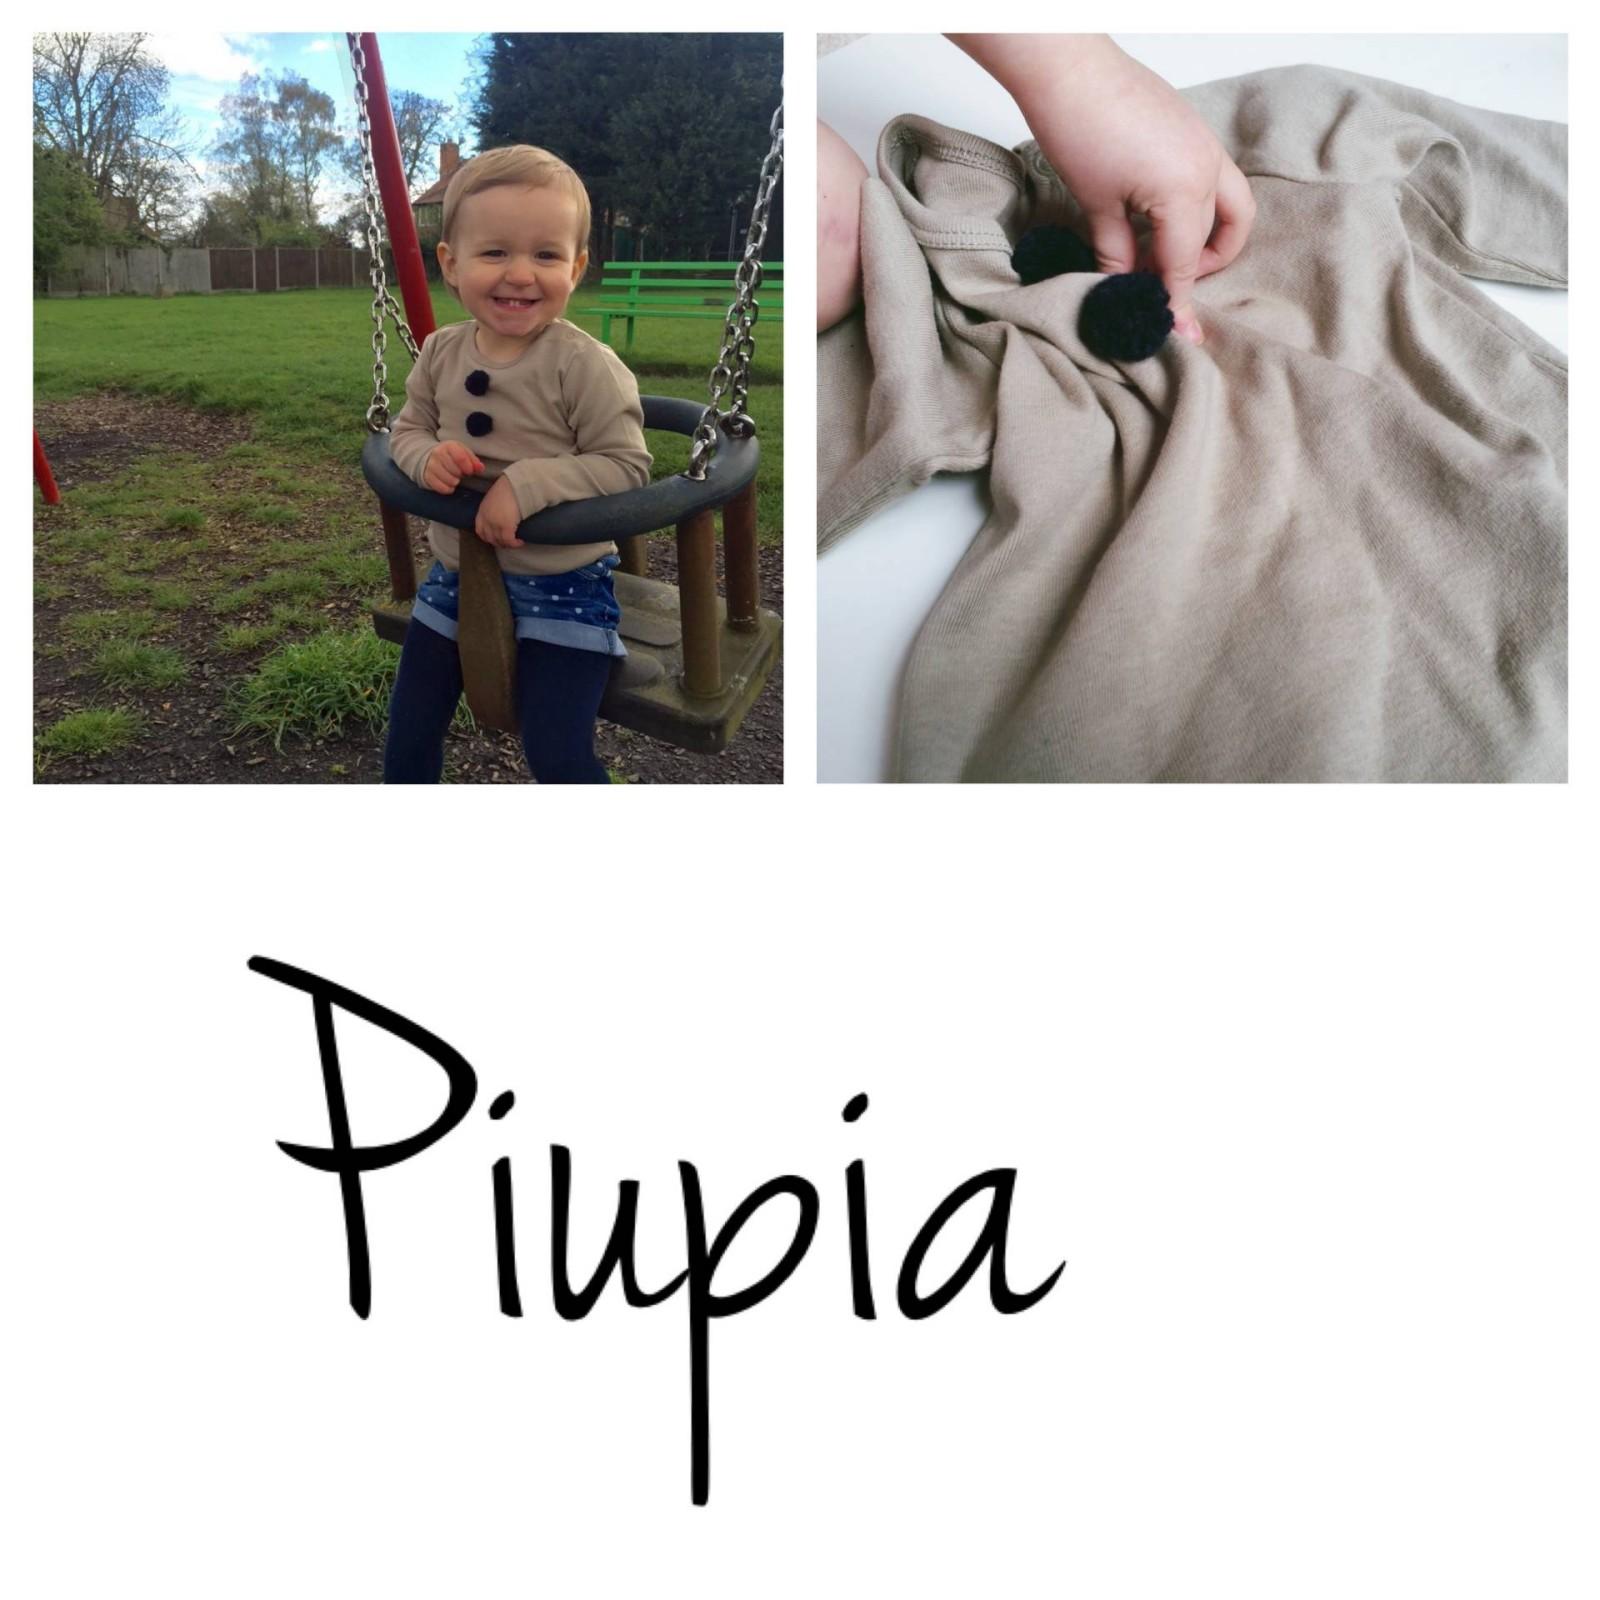 piupia review